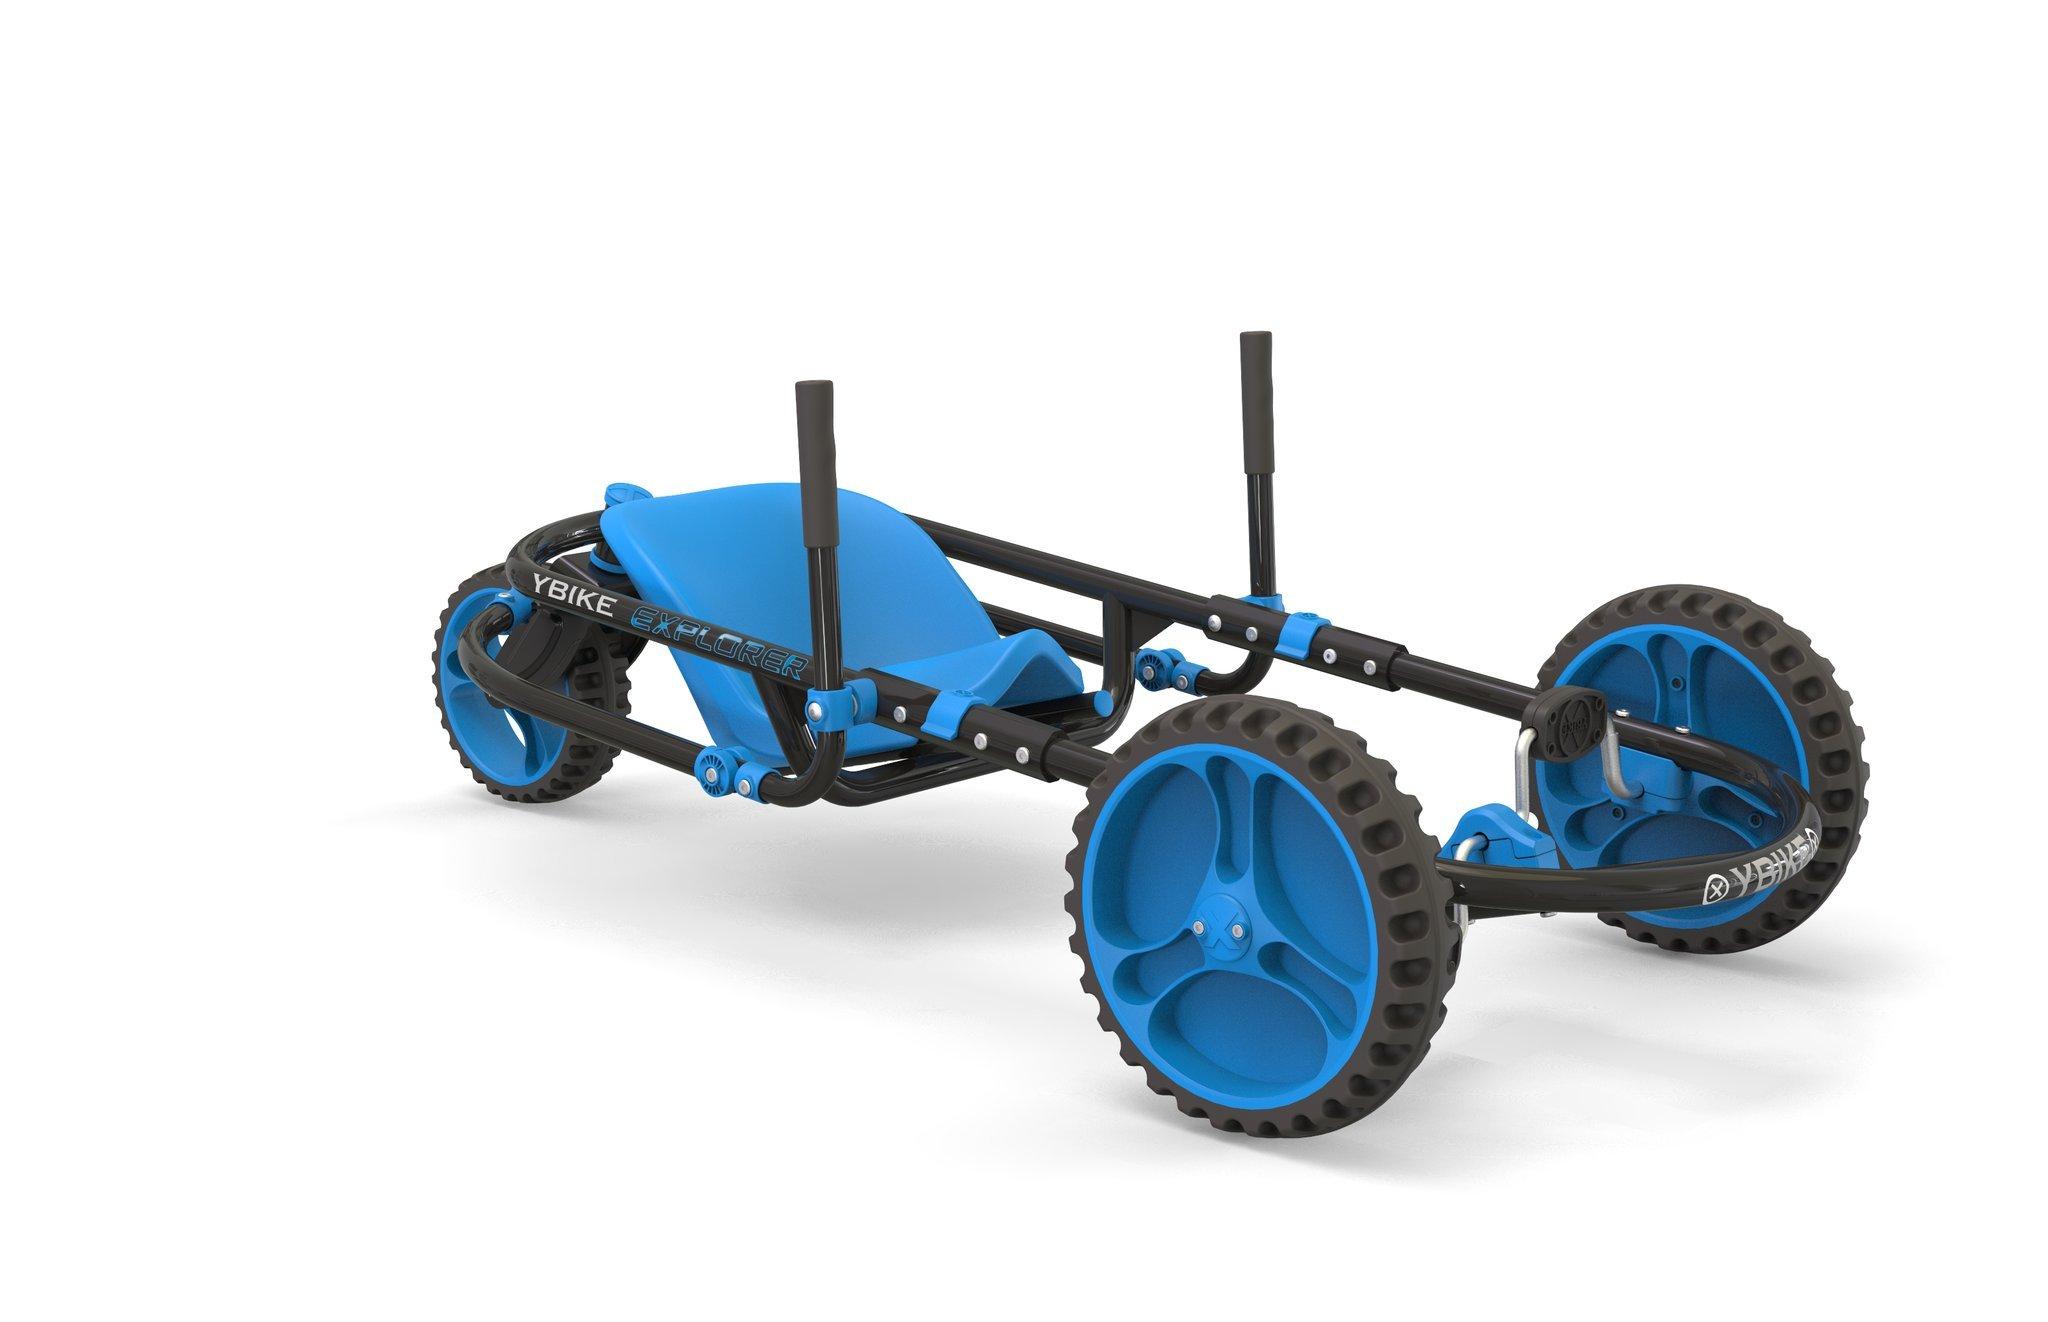 YBIKE Explorer Pedal Car, Blue/Black by YBIKE (Image #1)